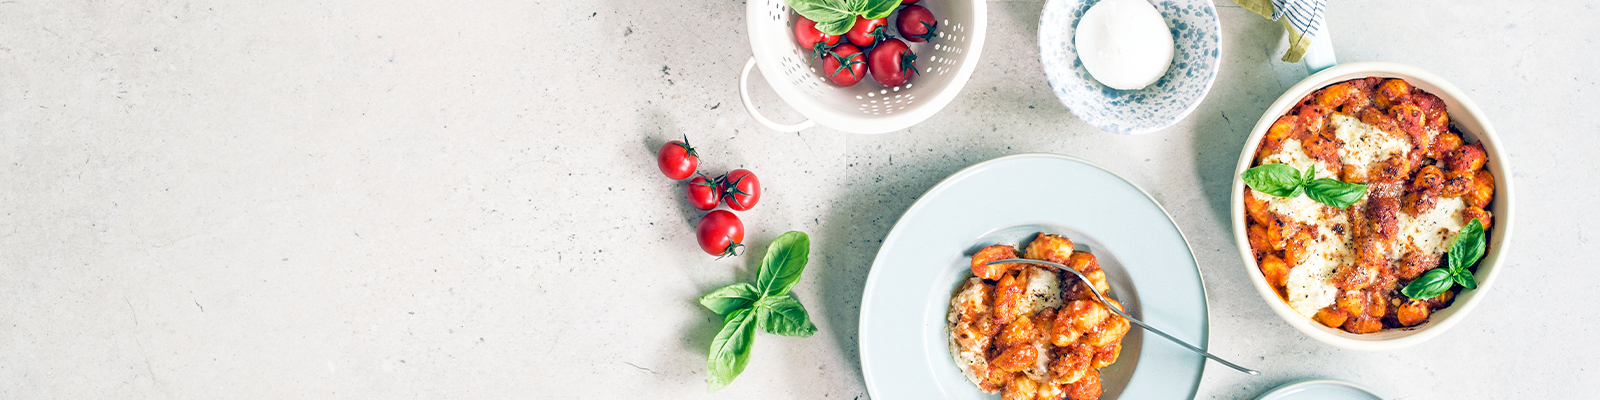 Pasta Garofalo - Gnocchi